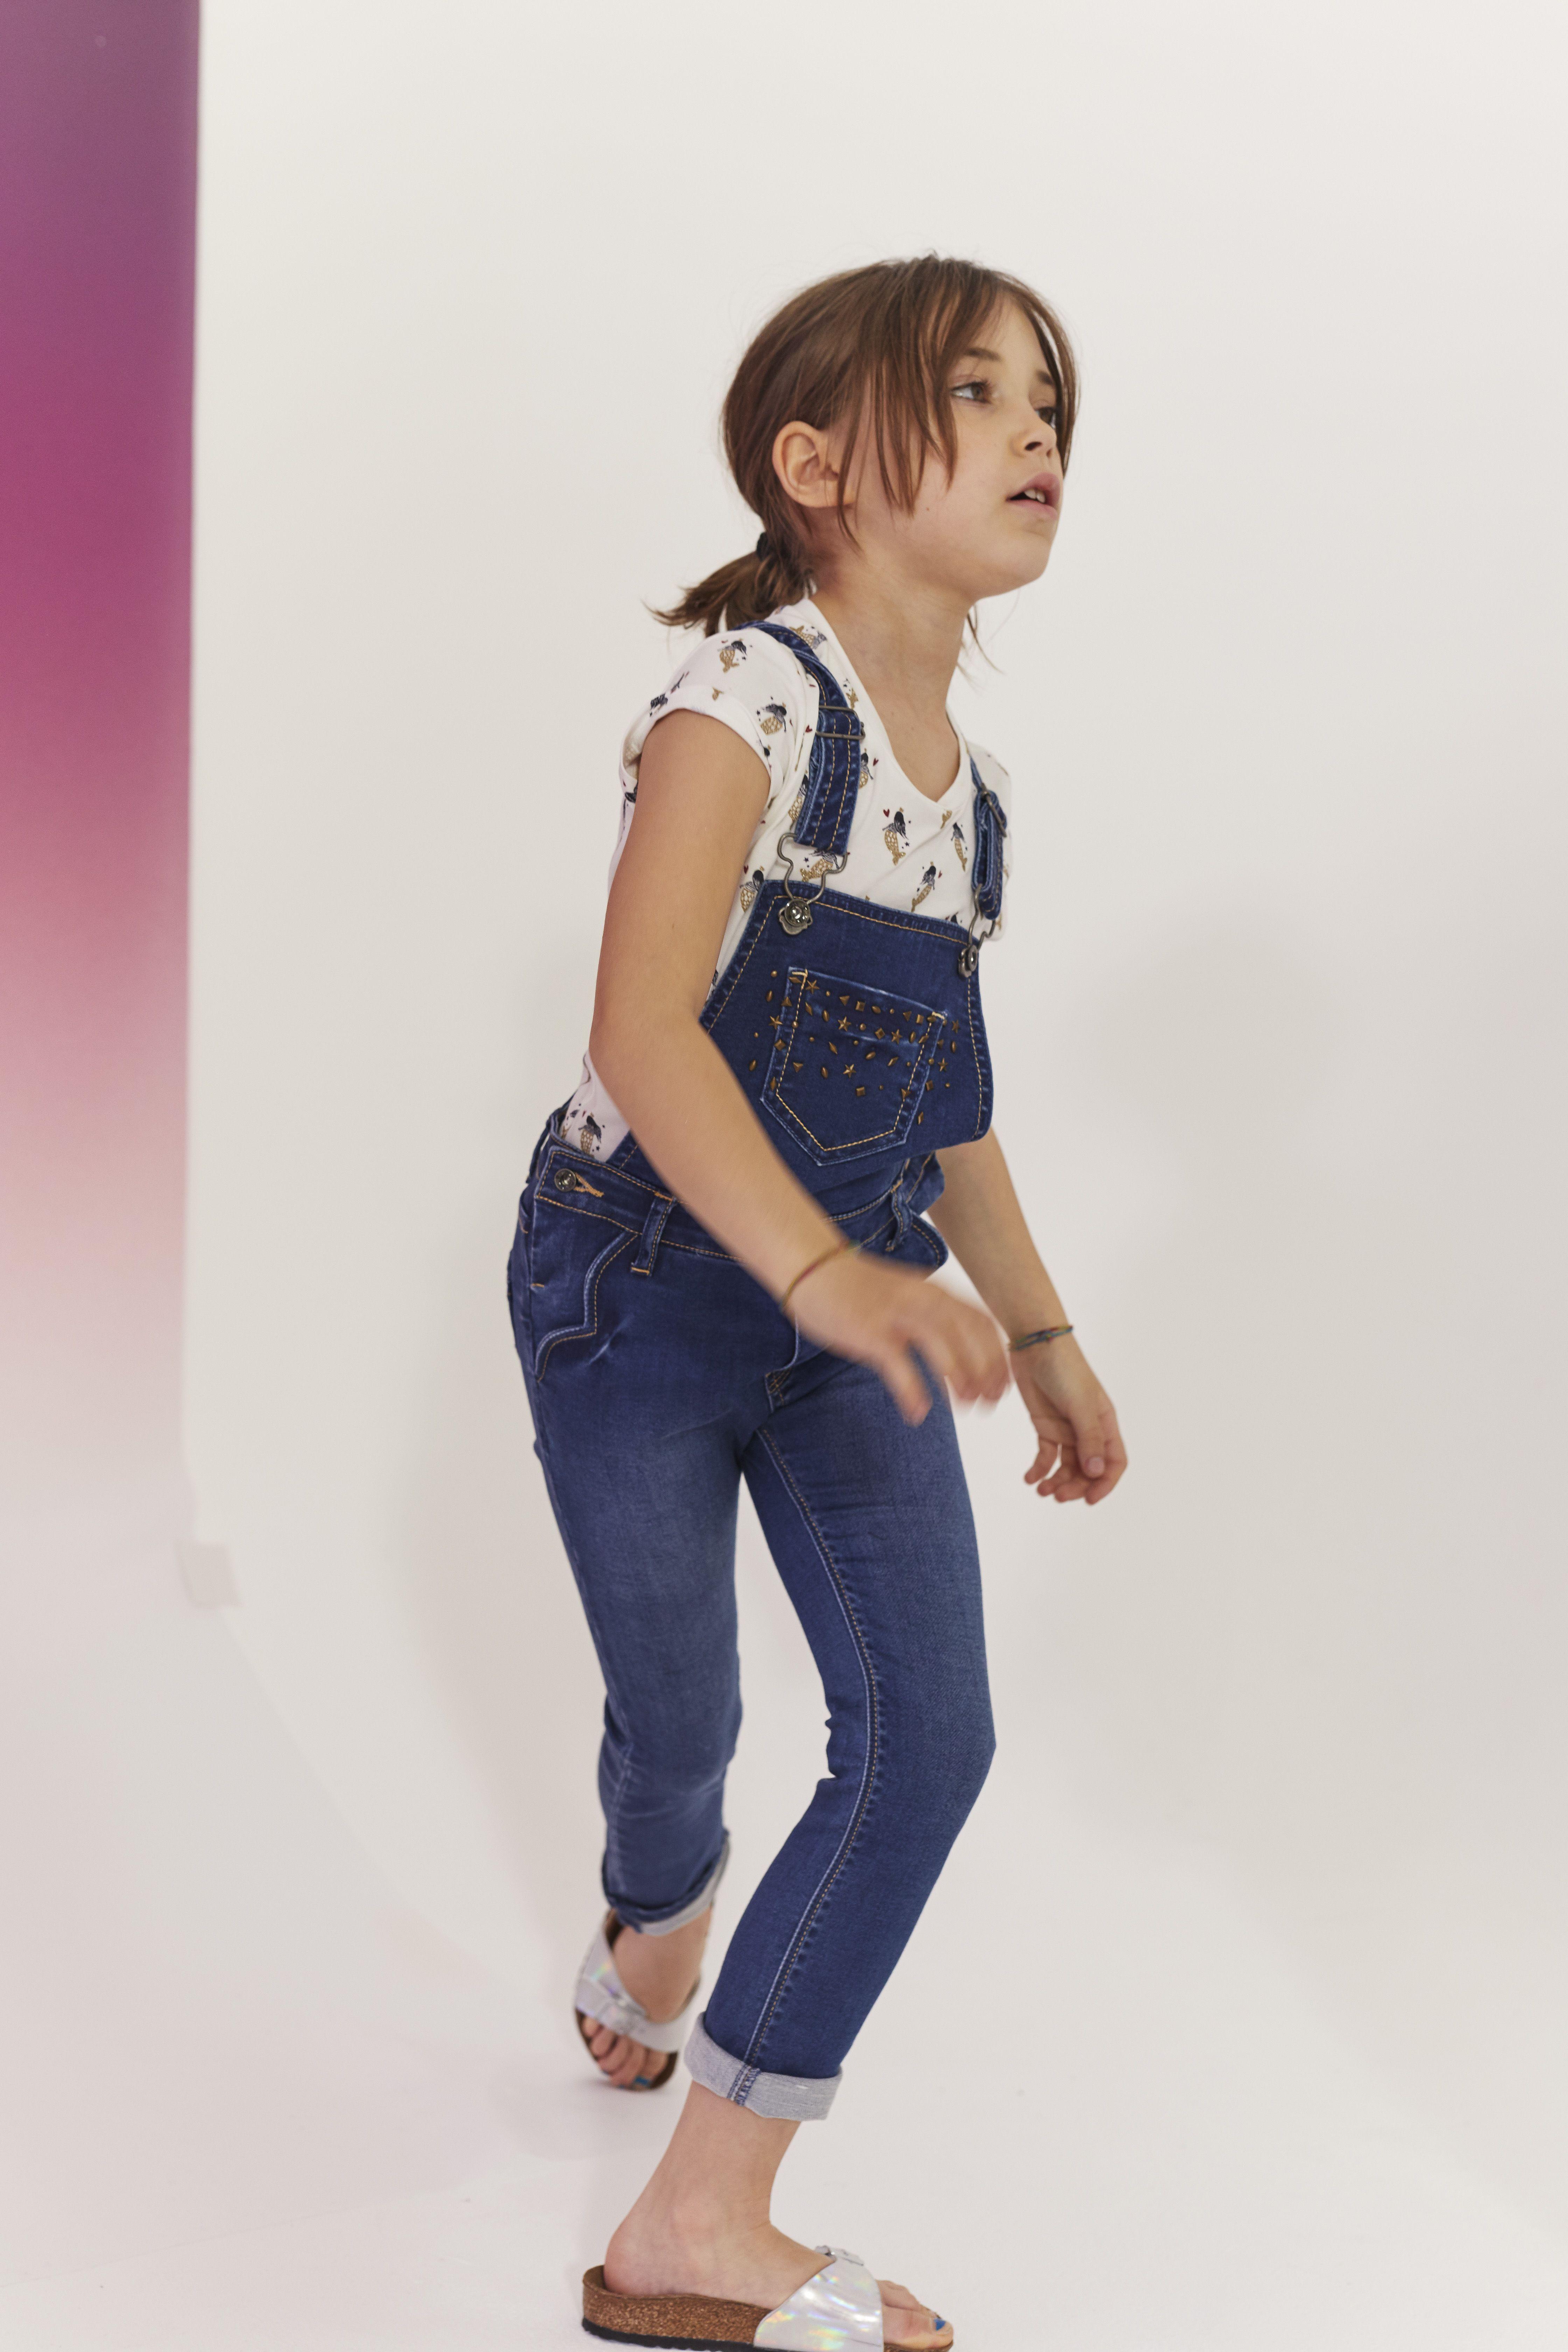 a9567acac6756 Look fille salopette en jean et tee-shirt imprimé sirènes Automne-Hiver  2017/2018 collection IKKS Kid Girl #aw17 #kidstyle